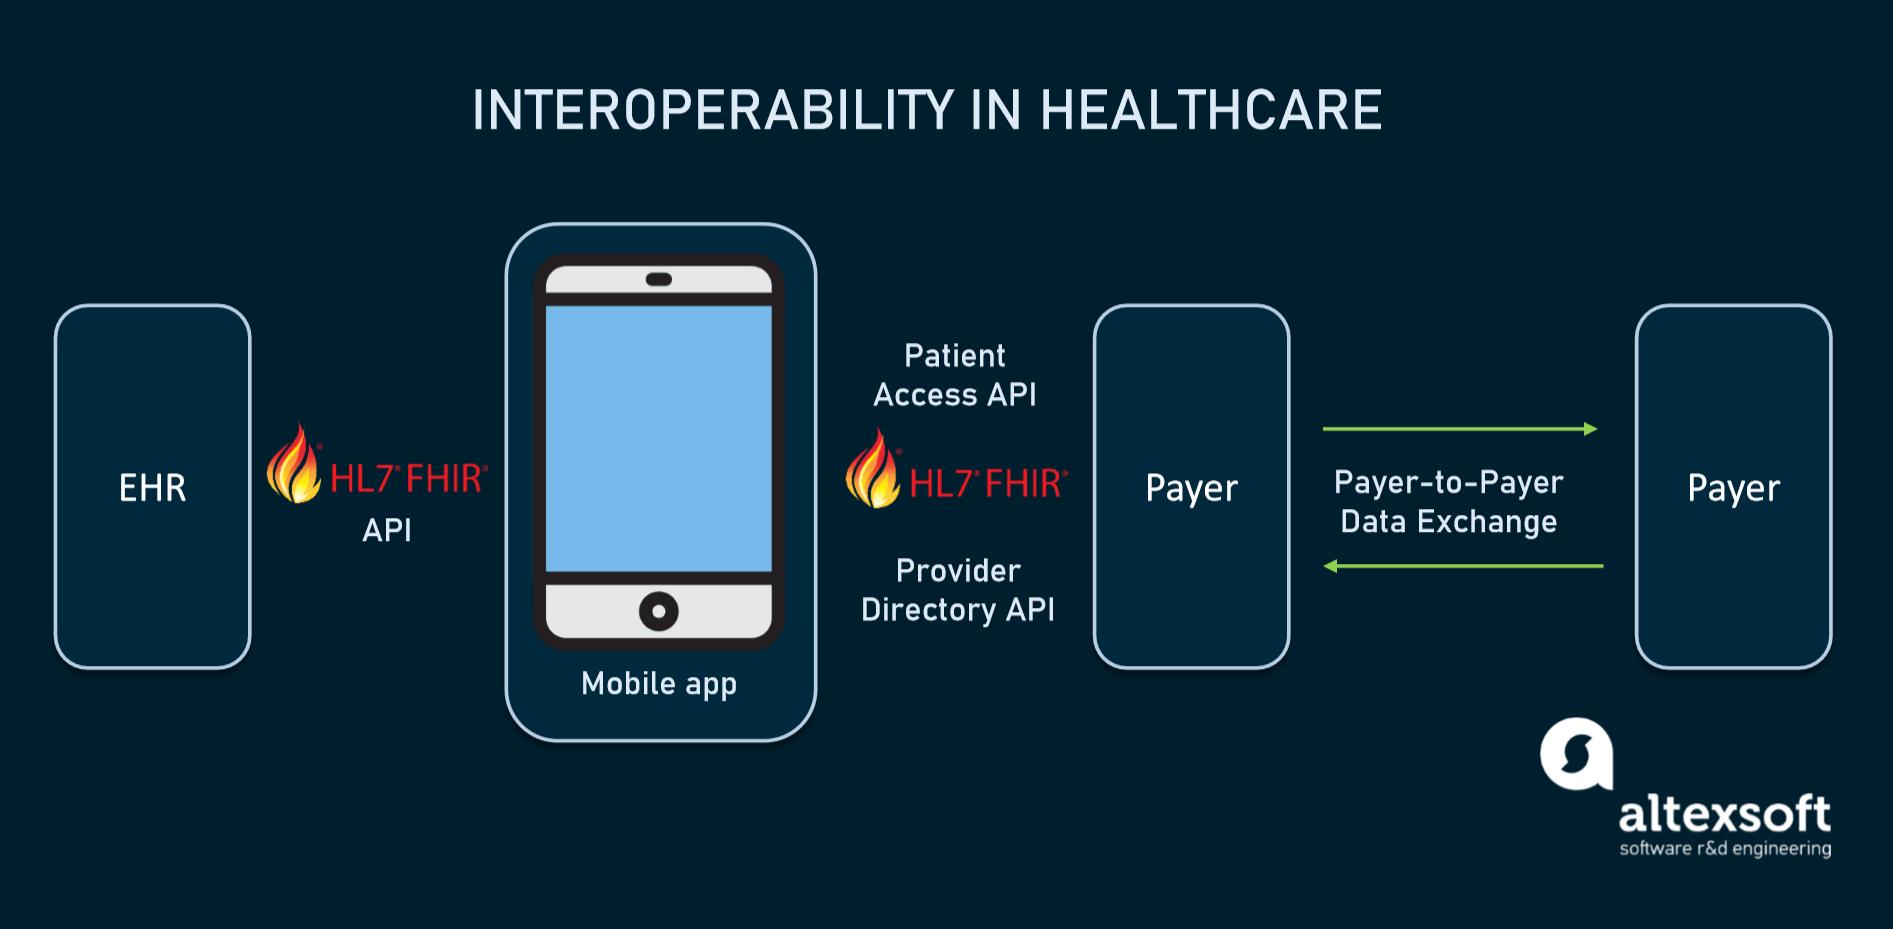 How interoperability works via FHIR API